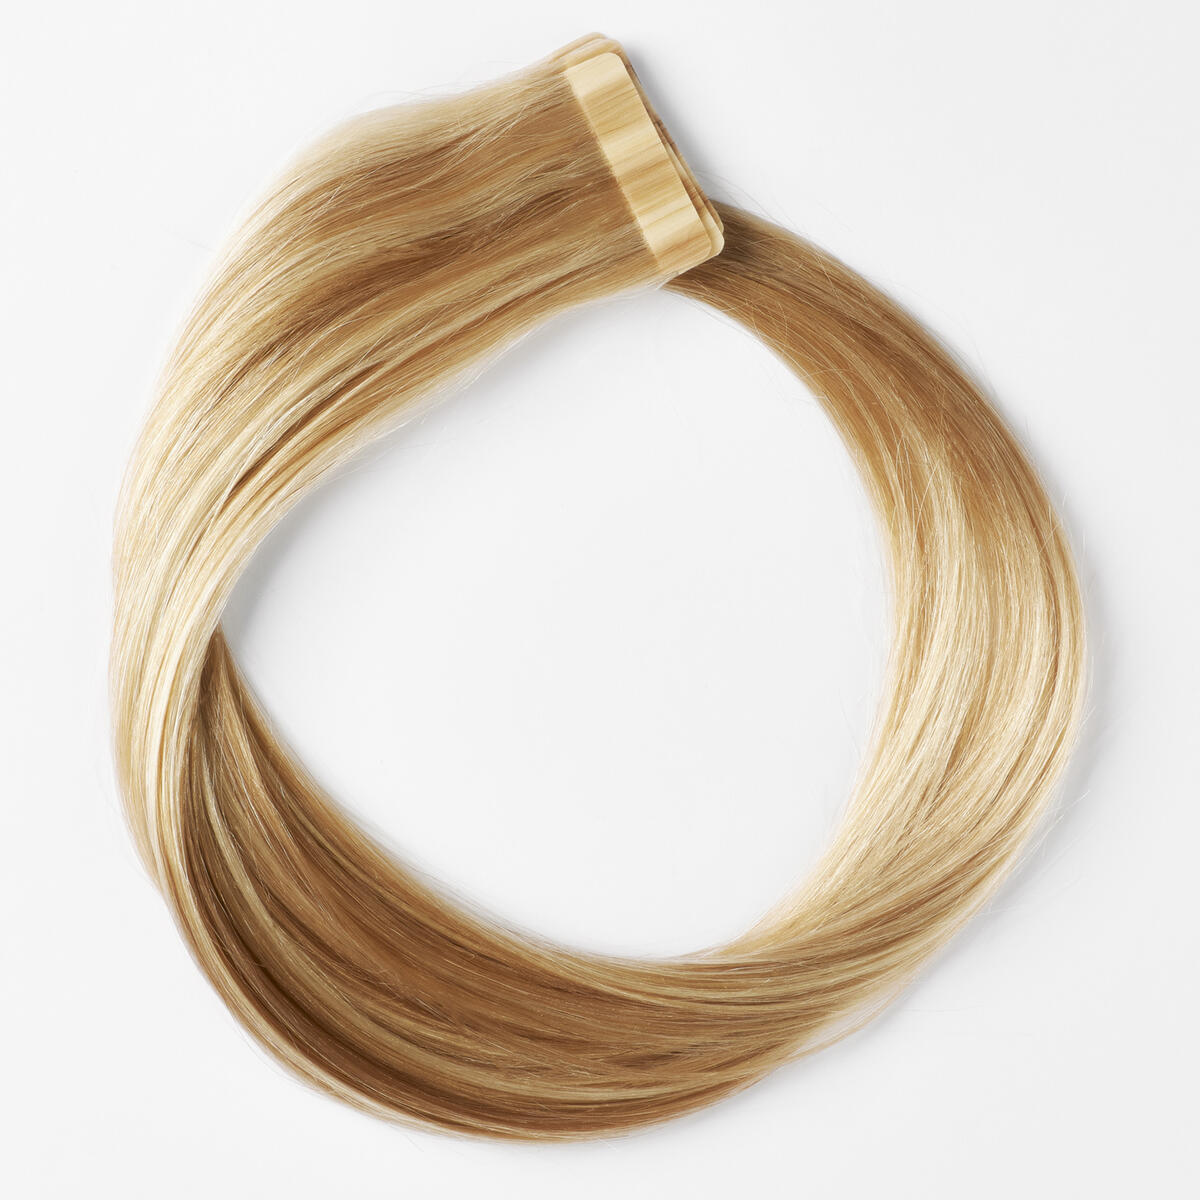 Quick & Easy Original M7.5/10.8 Scandinavian Blonde Mix 40 cm